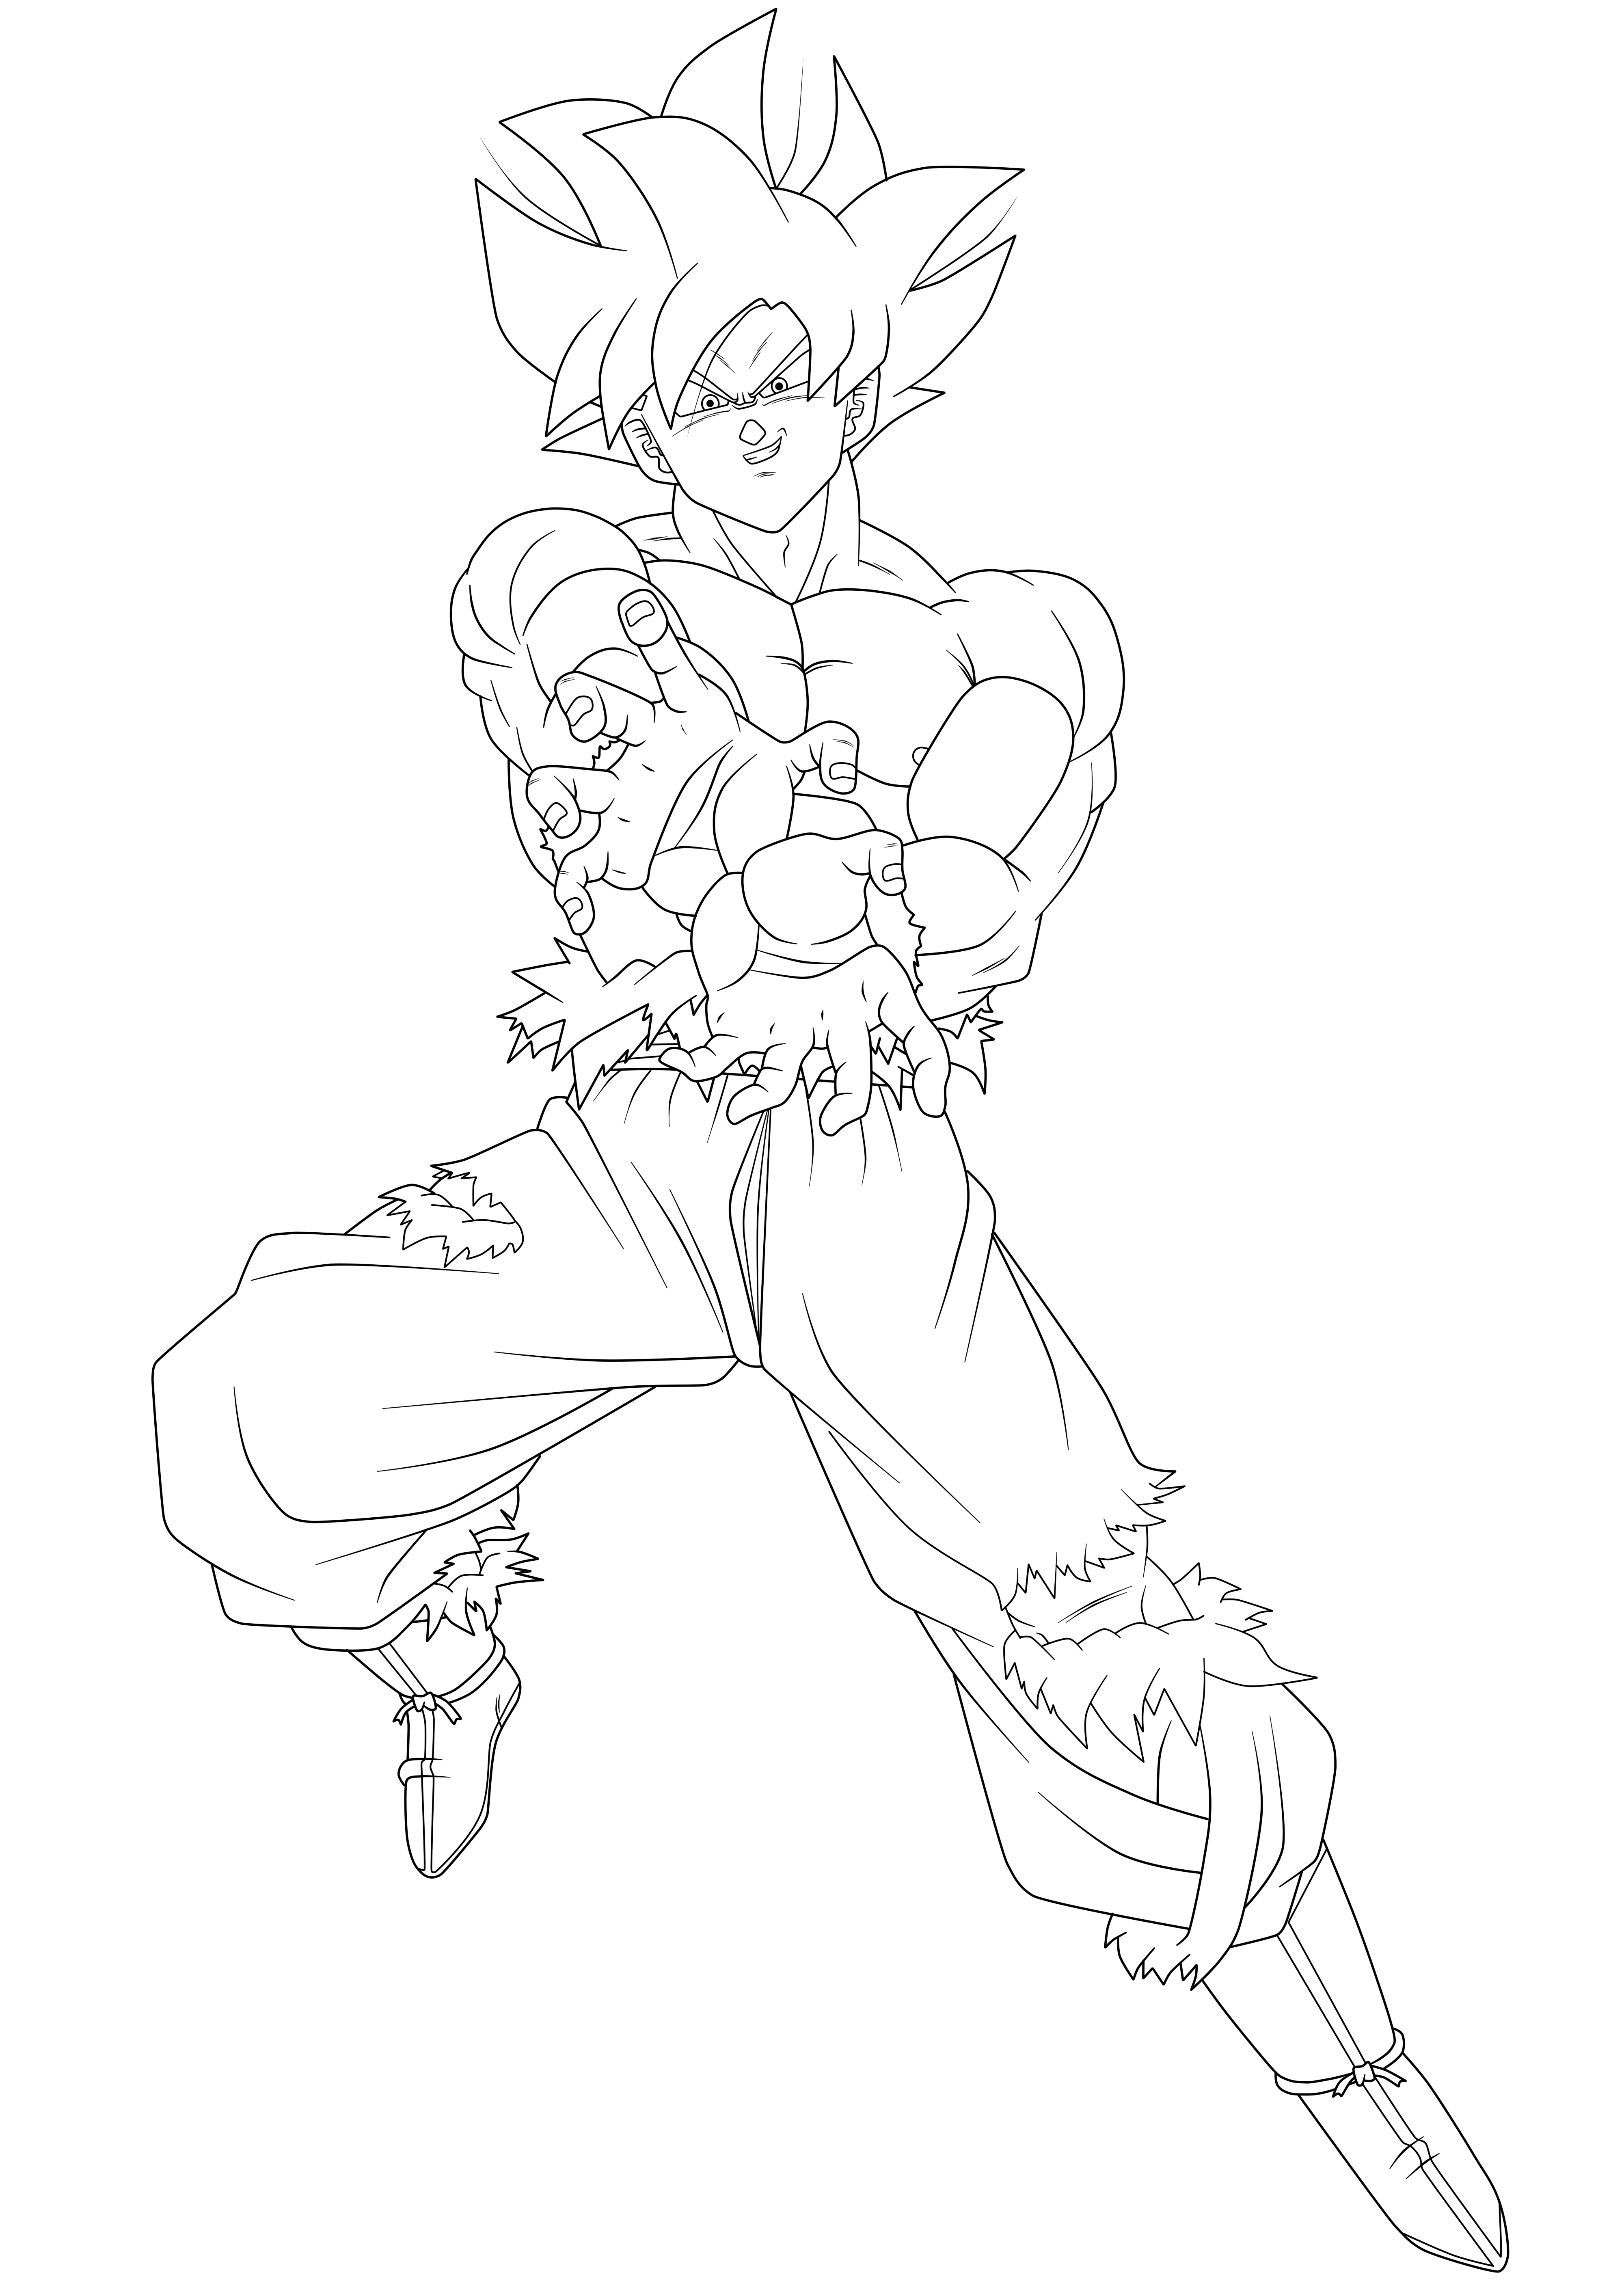 Migatte no Goku Lineart by HiroshiIanabaModder on DeviantArt